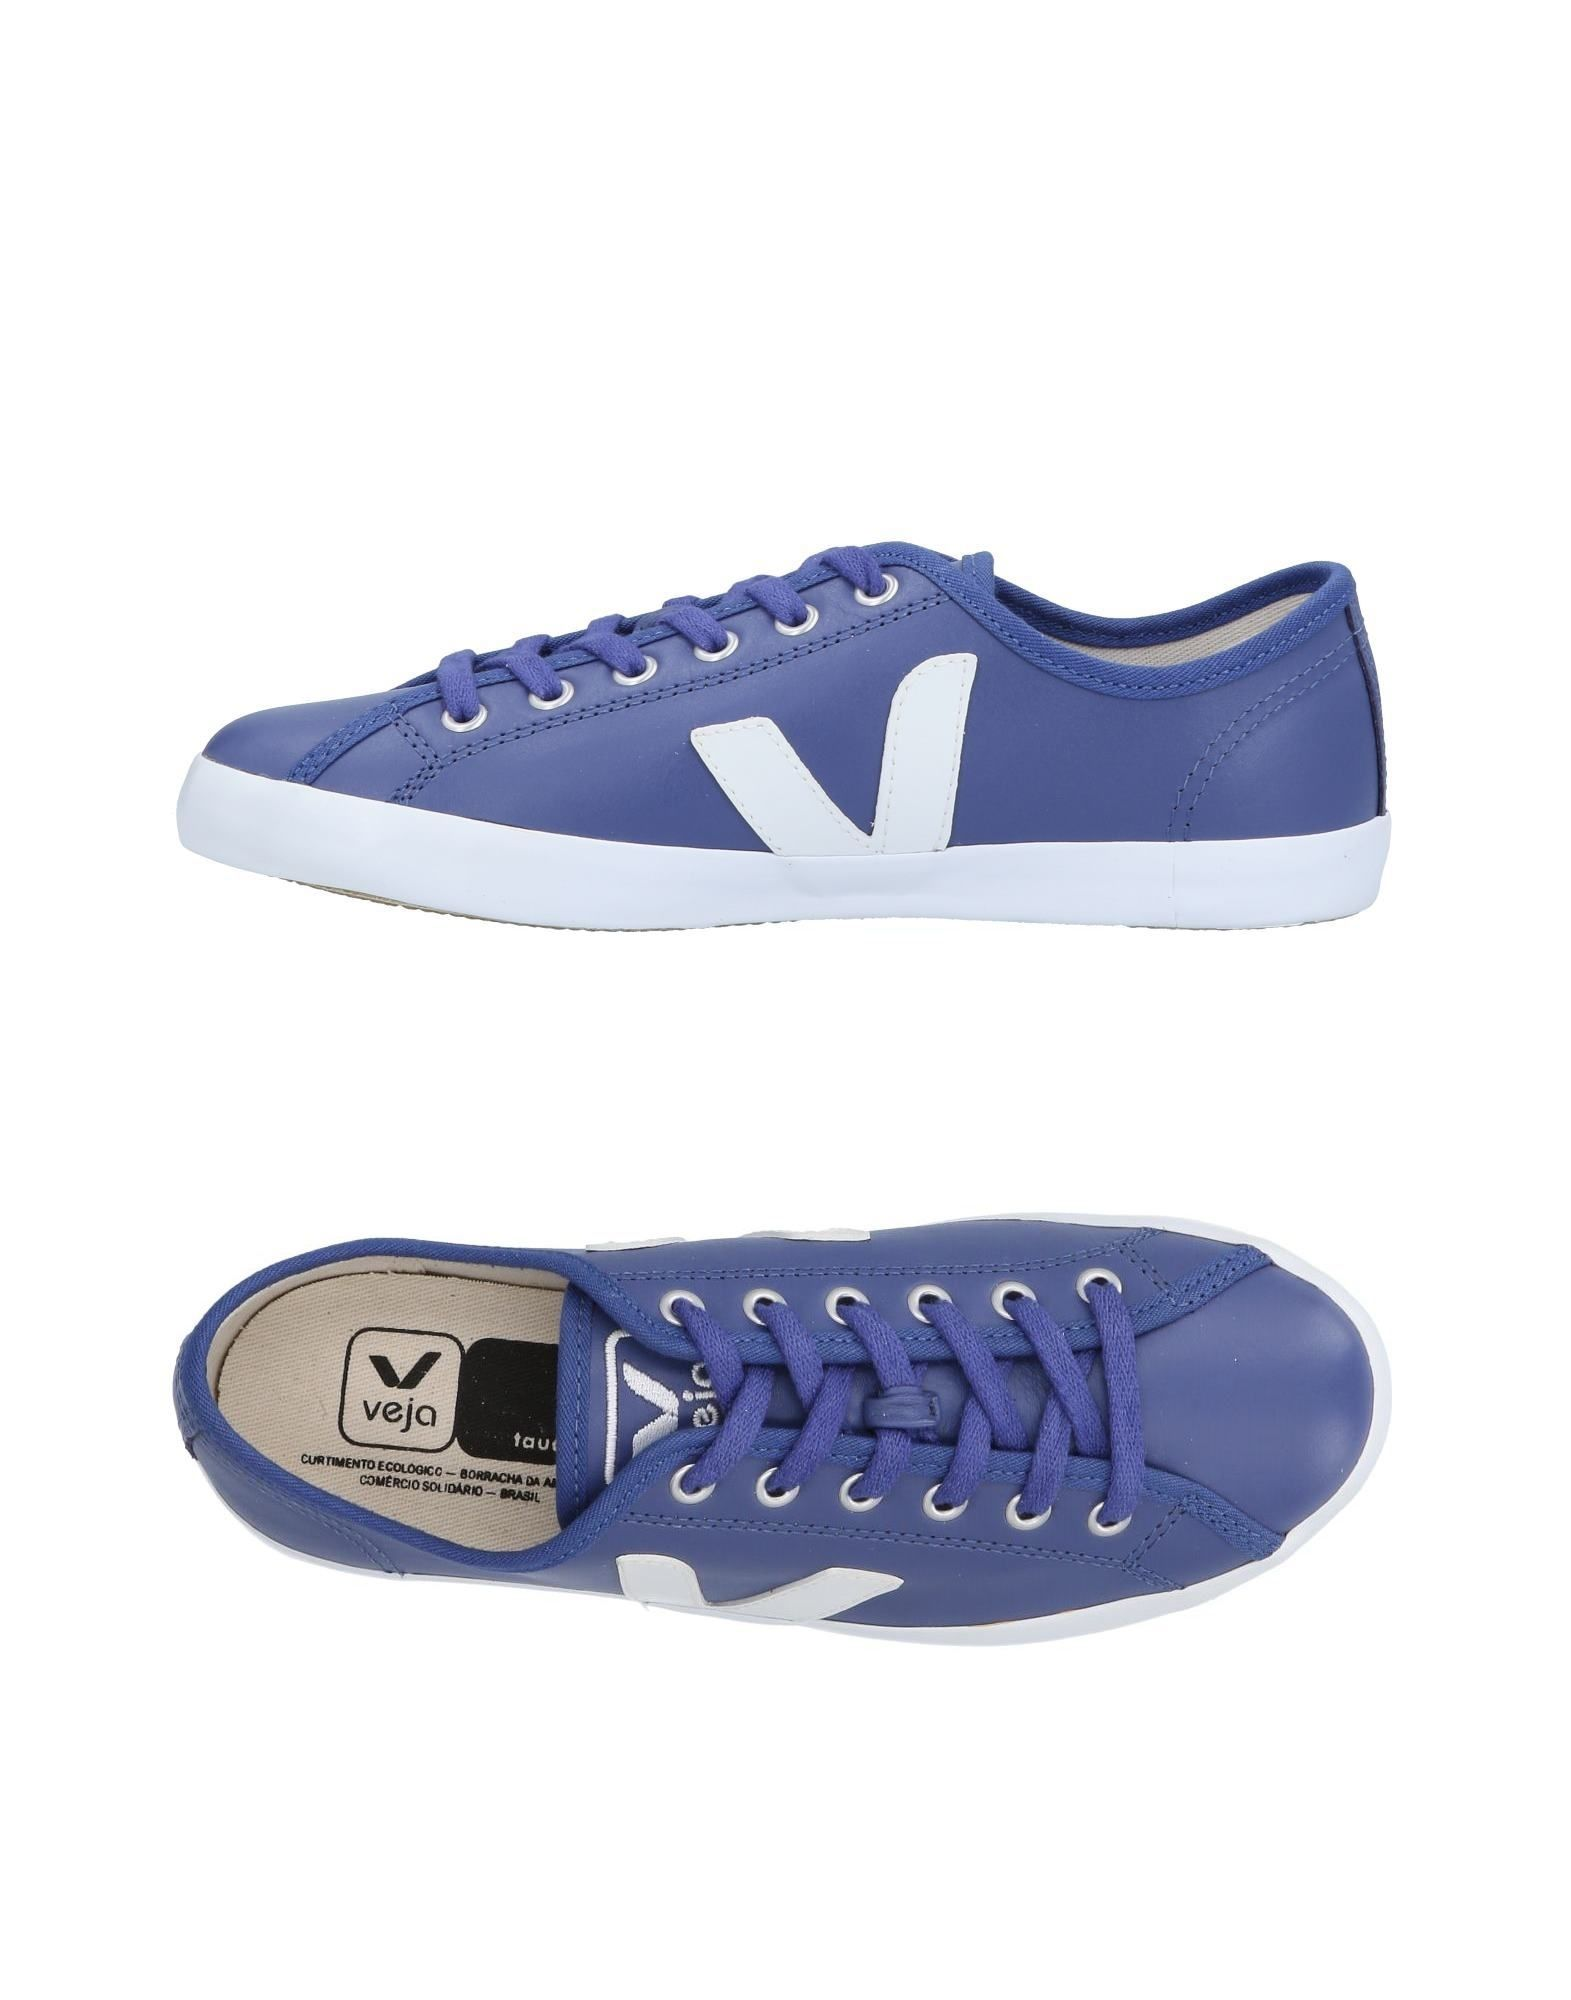 Veja Sneakers Qualität Damen  11498419NR Gute Qualität Sneakers beliebte Schuhe 478bbf